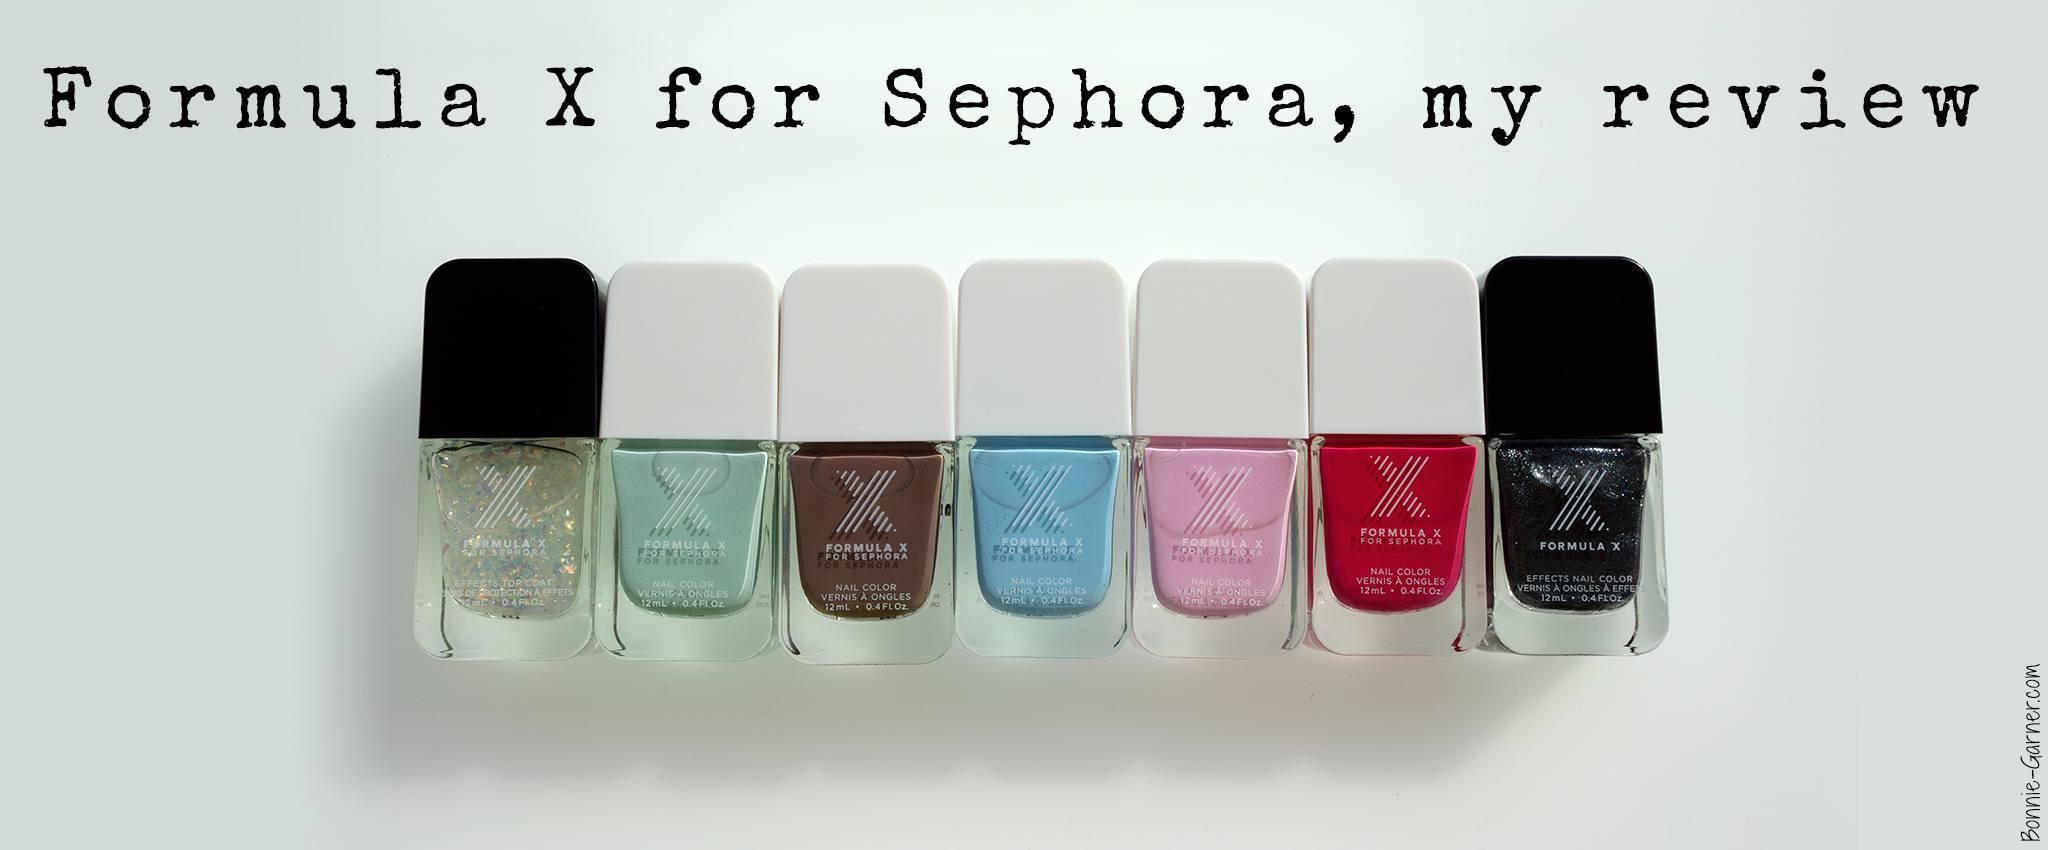 Formula X for Sephora my review